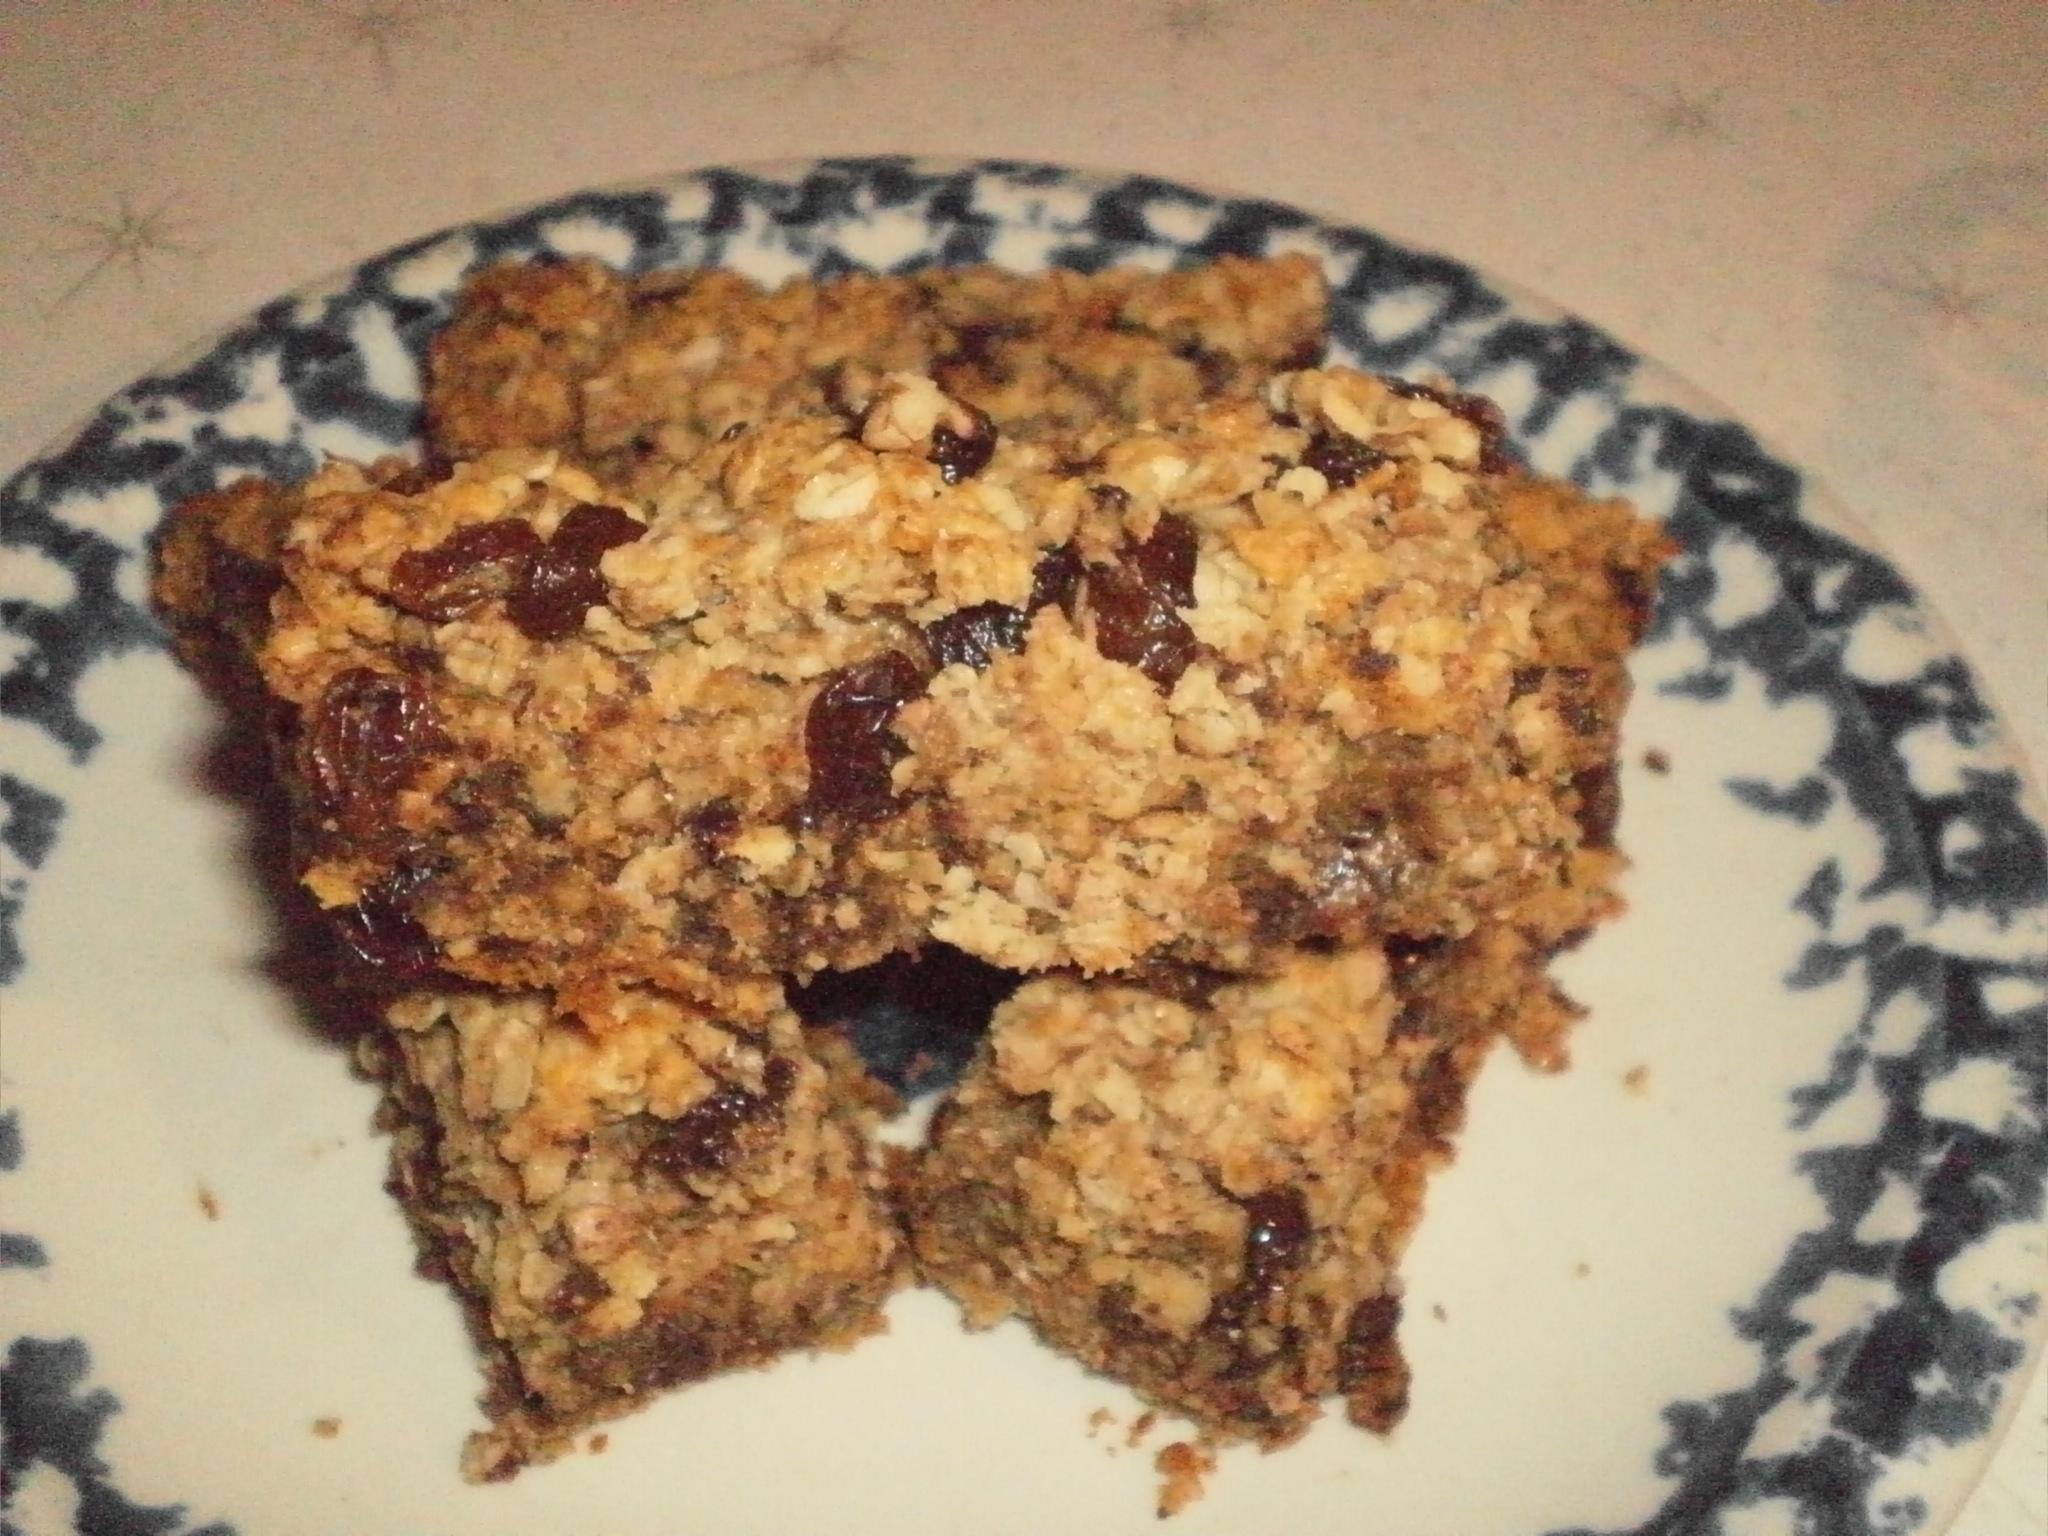 Barres tendres aux raisins secs et pépites de chocolat